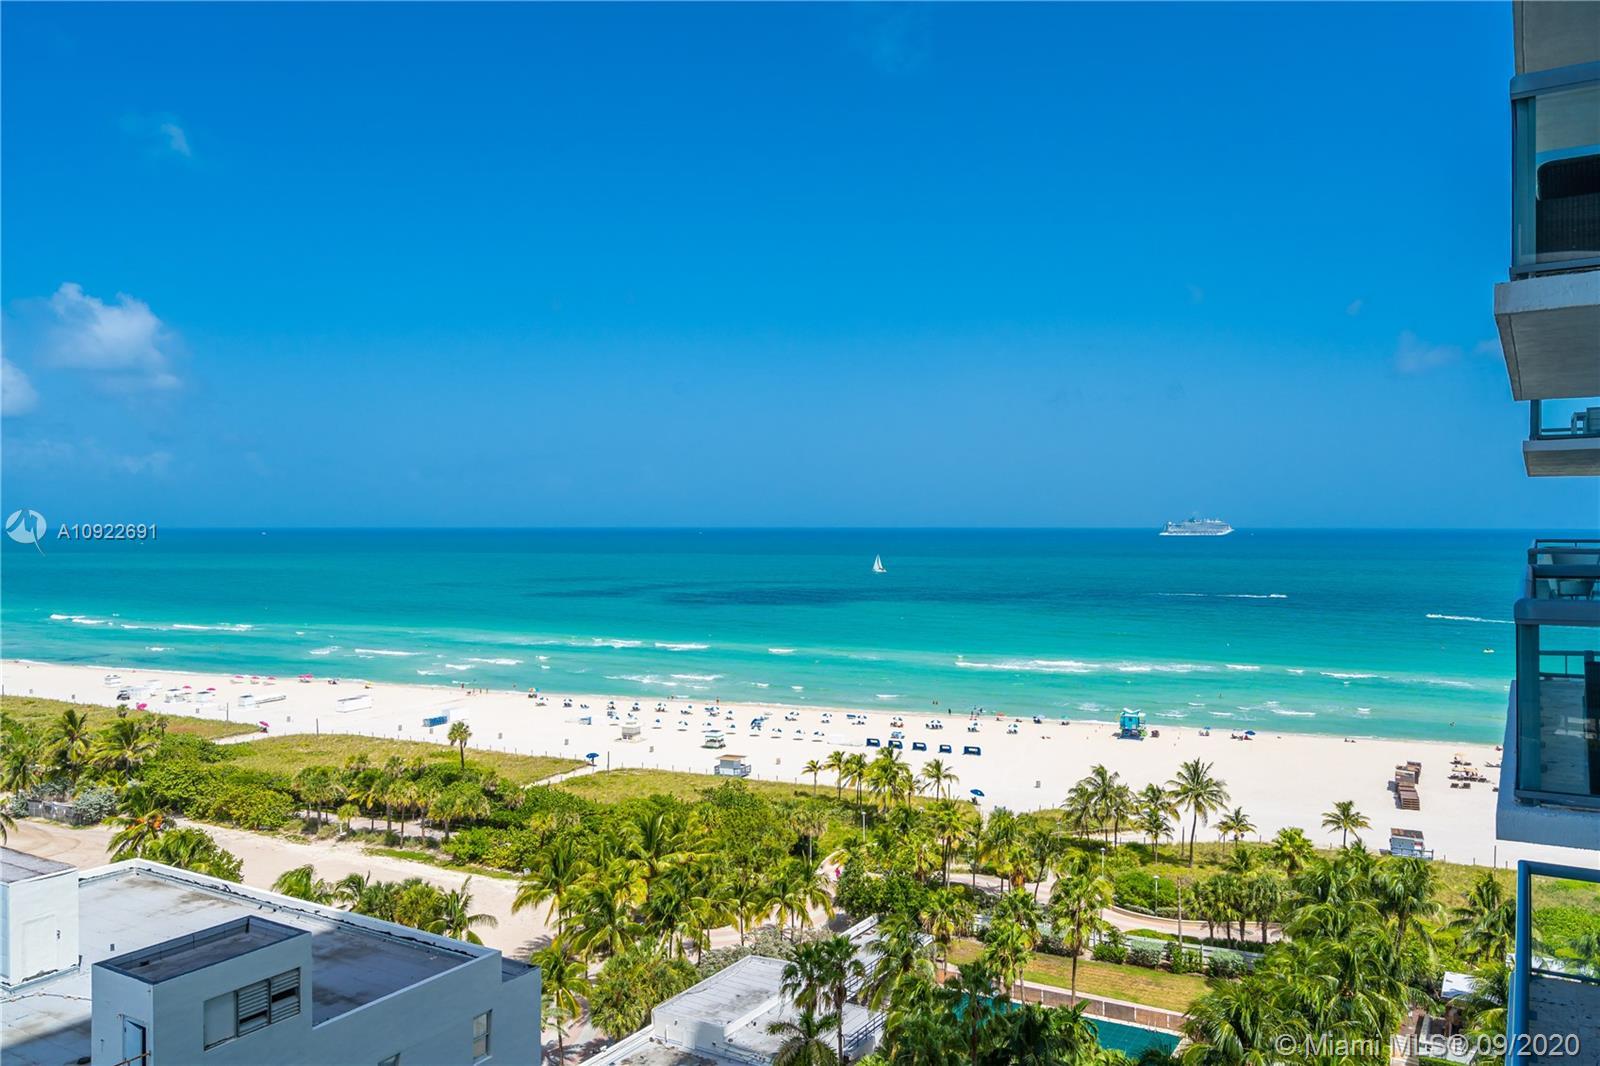 101 20th St Unit 1803, Miami Beach, Florida 33139